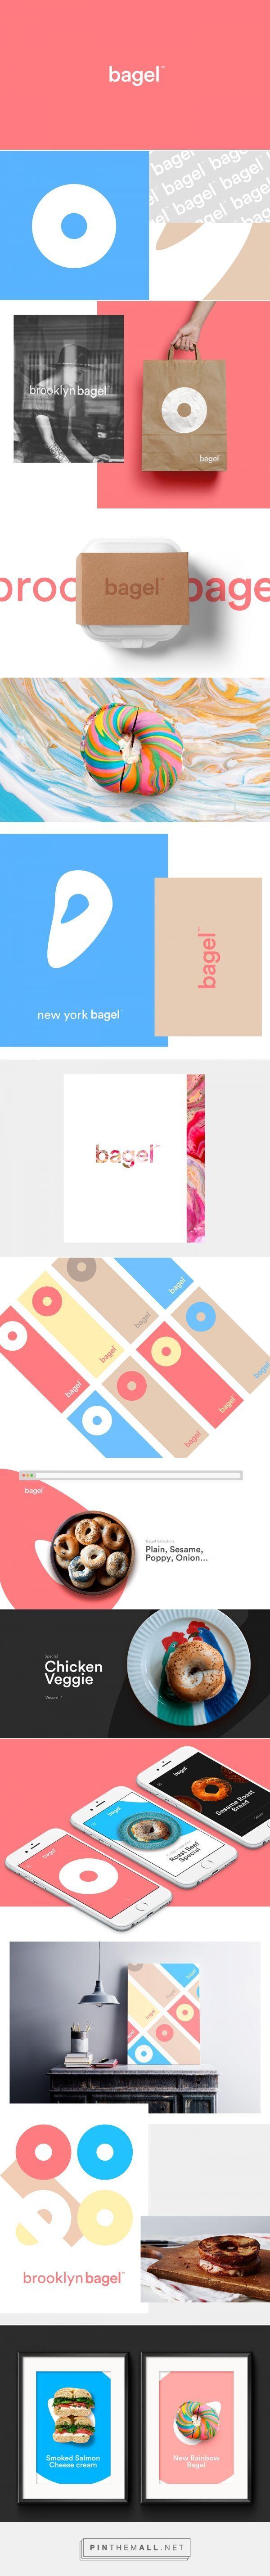 bagel™ - visual identity on Behance